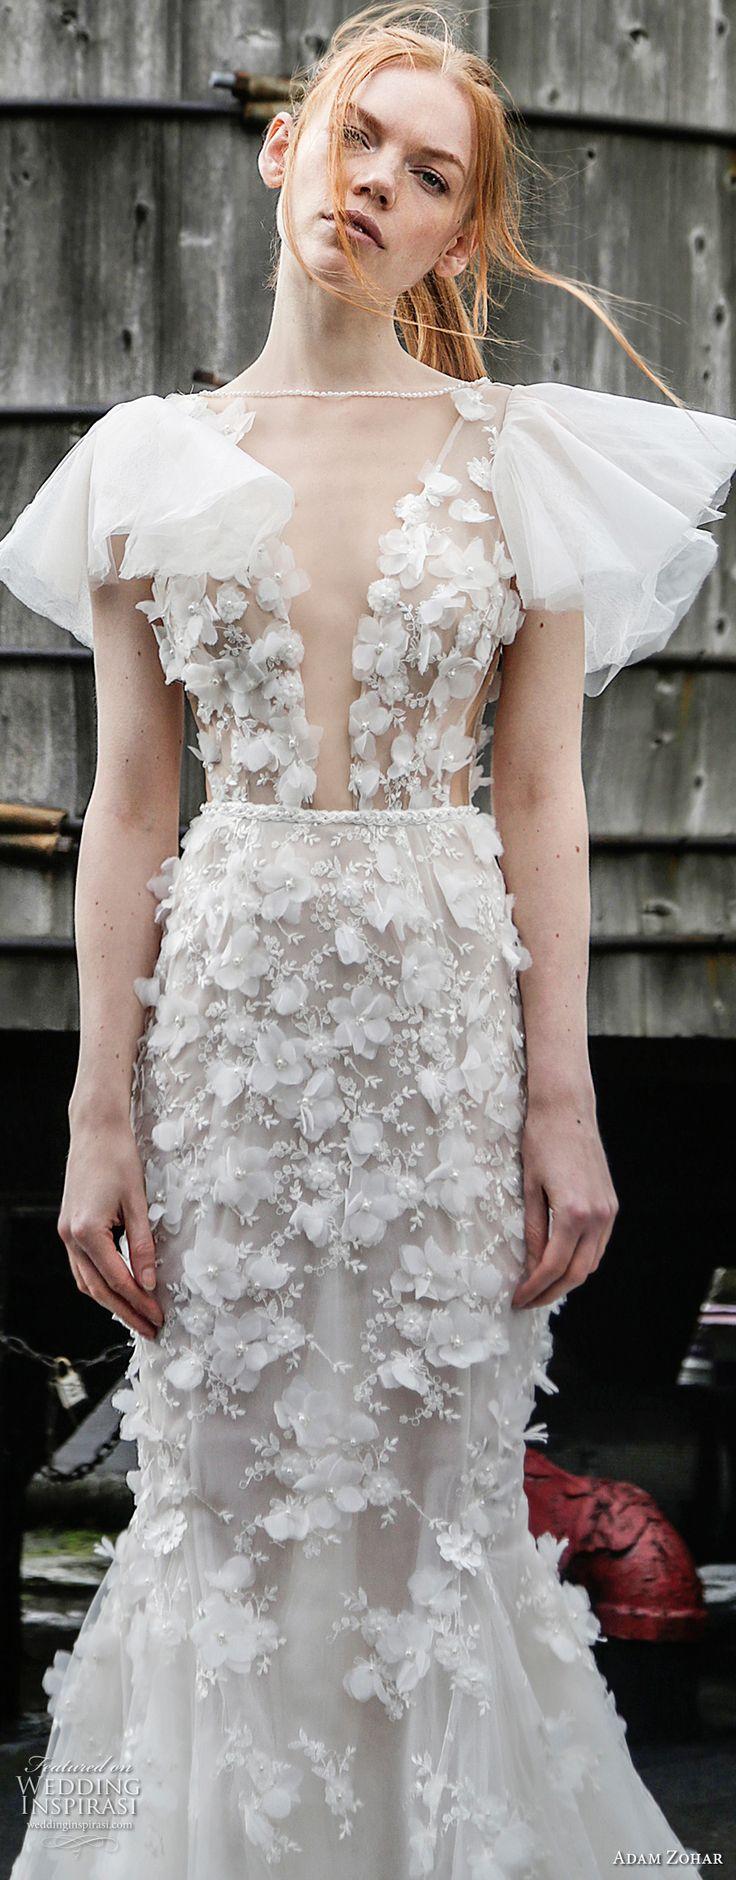 adam zohar 2017 bridal butterfly sleeves illusion bateau deep plunging v neck full embellishment sexy romantic mermaid wedding dress open back chapel train (13) zv